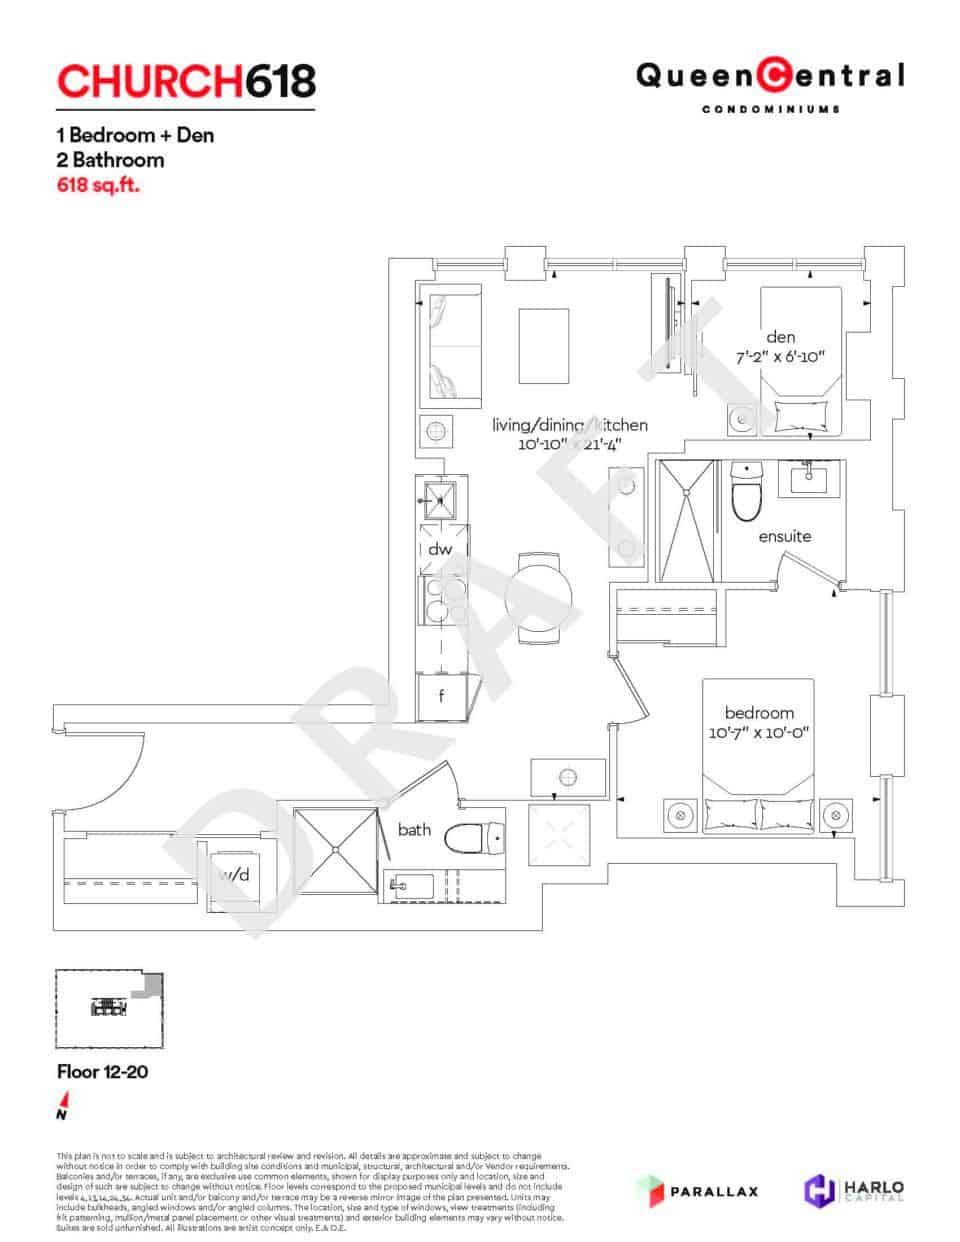 Queen Central Draft Floor Plans CHURCH 618